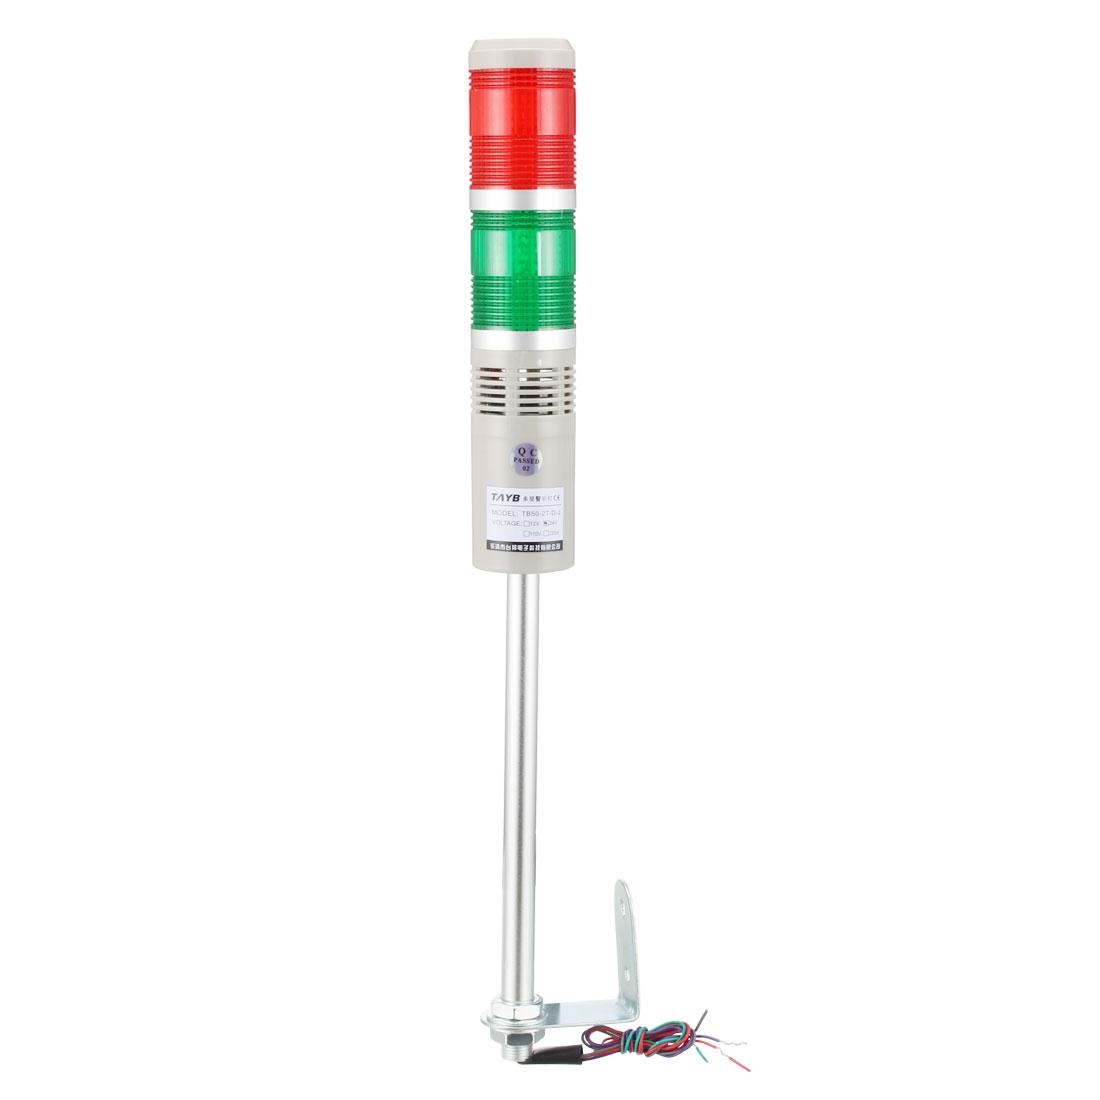 LED Warning Light Bulb Bright Signal Alarm Tower Lamp 90db DC24V Red Green